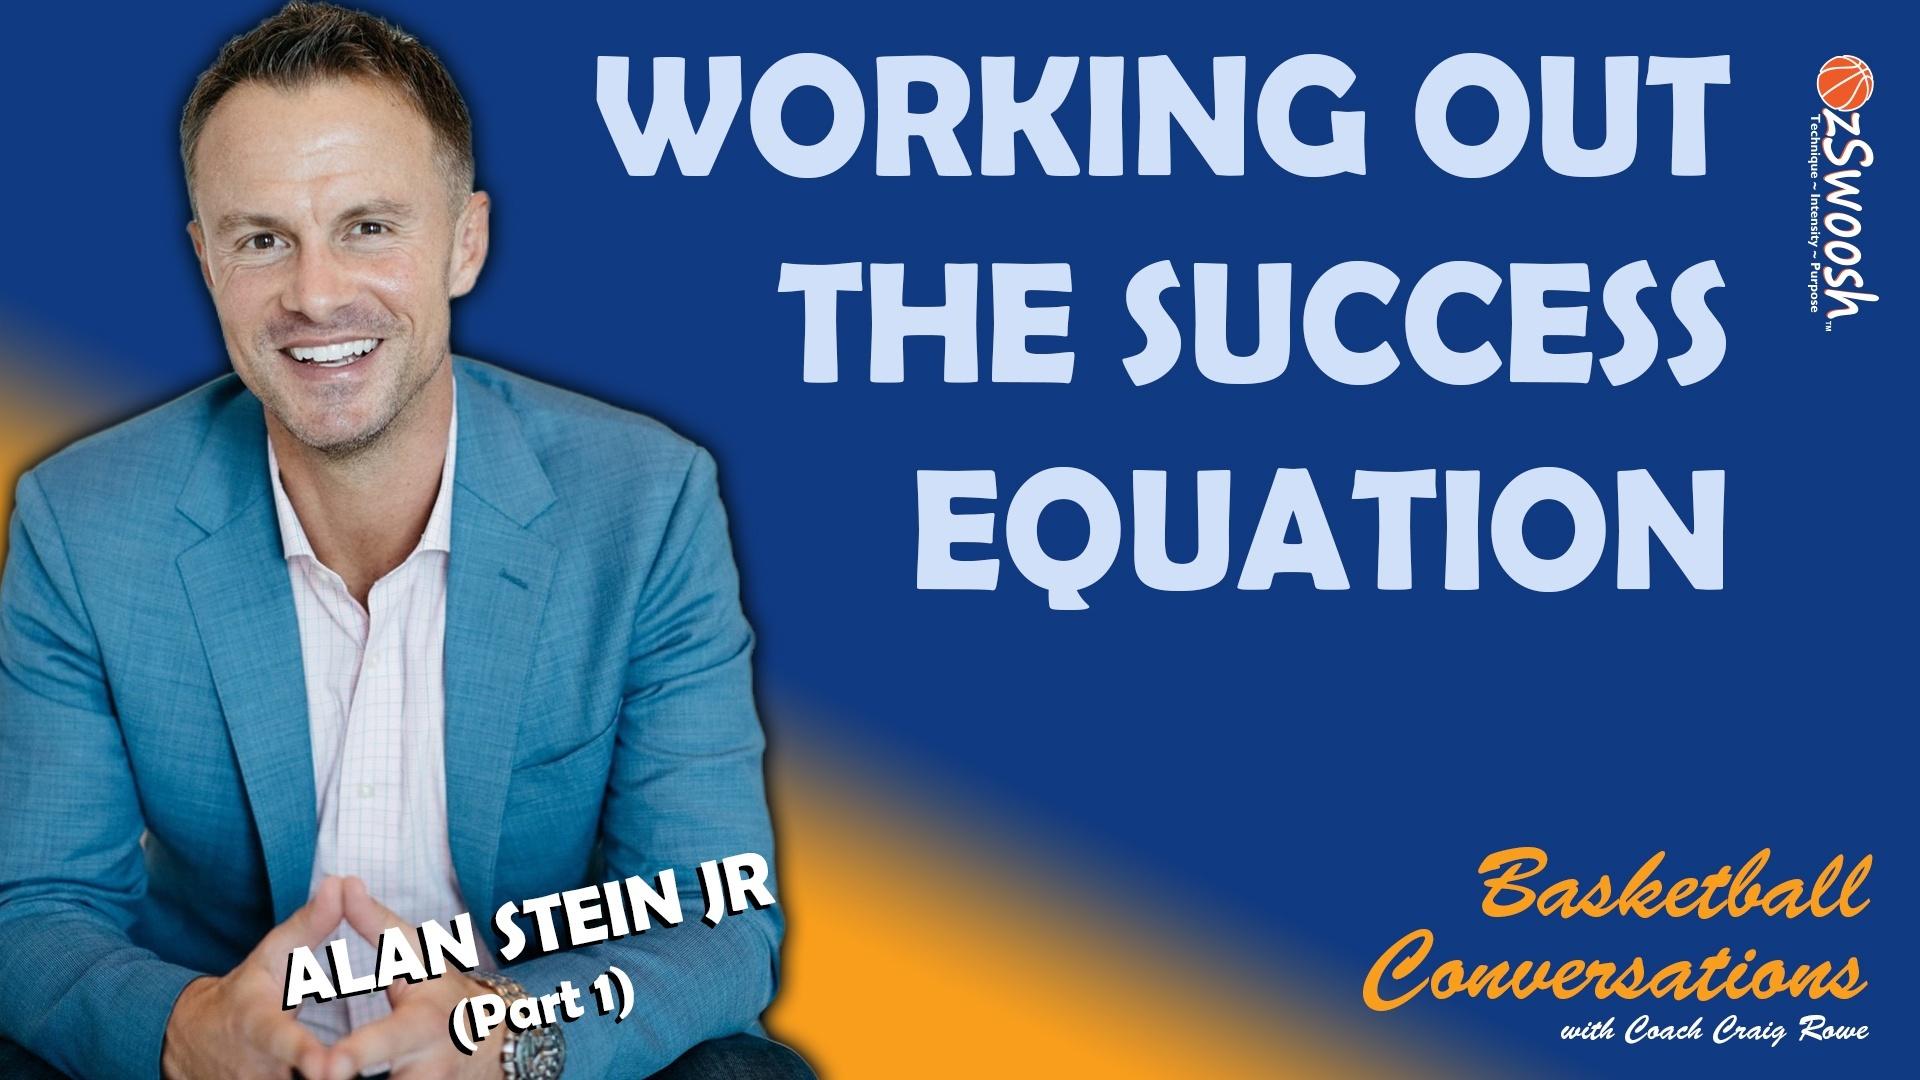 Alan Stein Jnr The Success Equation